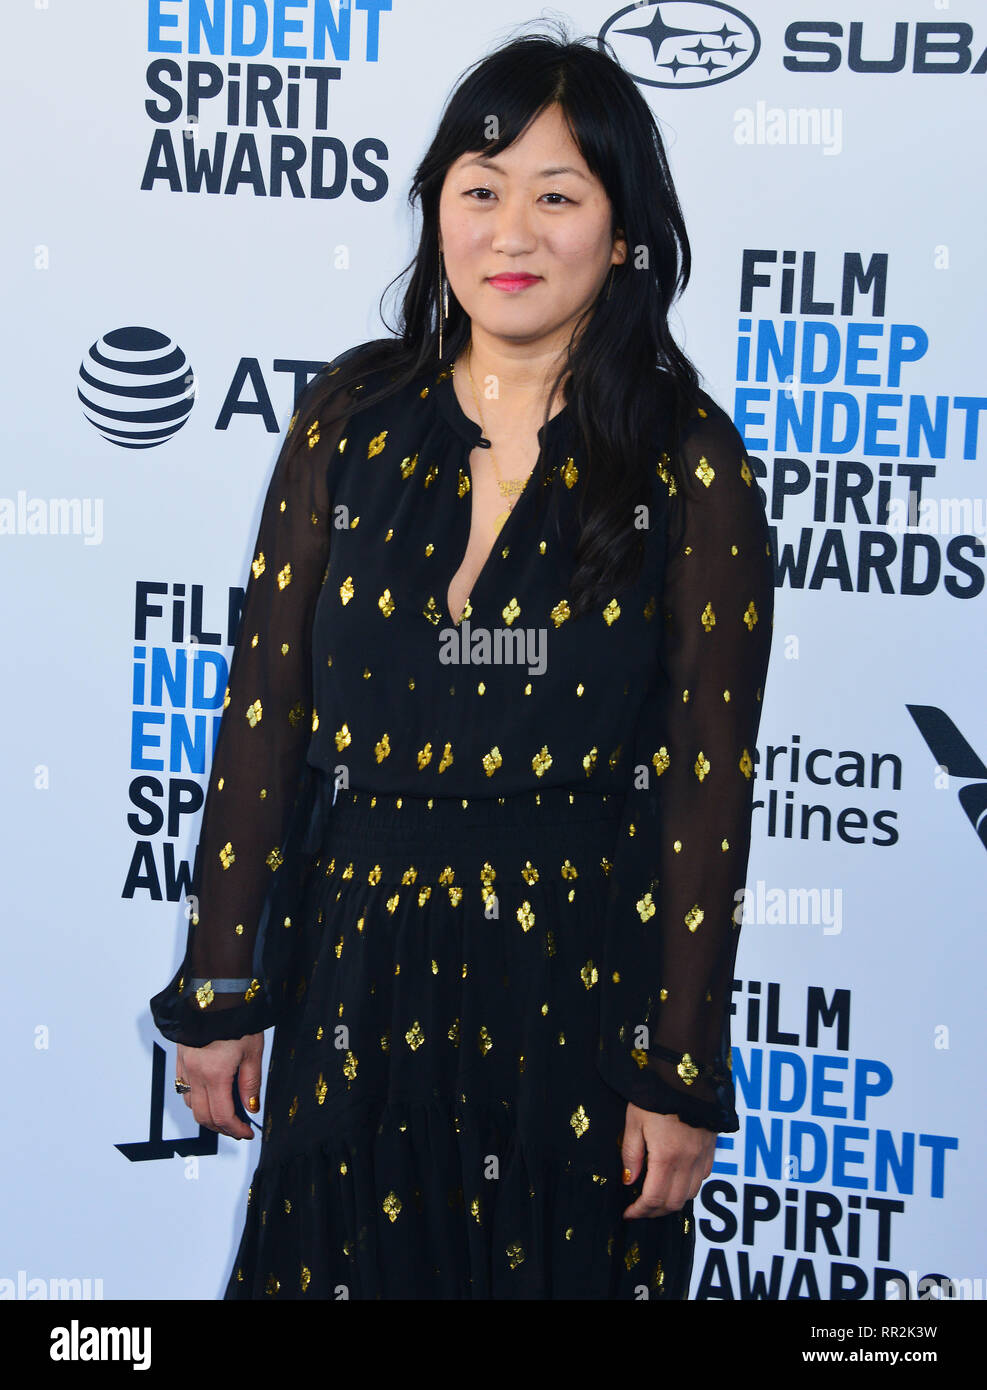 Santa Monica, Californie, USA. Feb 23, 2019. Christina Choe 157 assiste à la Film Independent Spirit Awards 2019 le 23 février 2019 à Santa Monica, en Californie. Credit: Tsuni / USA/Alamy Live News Photo Stock